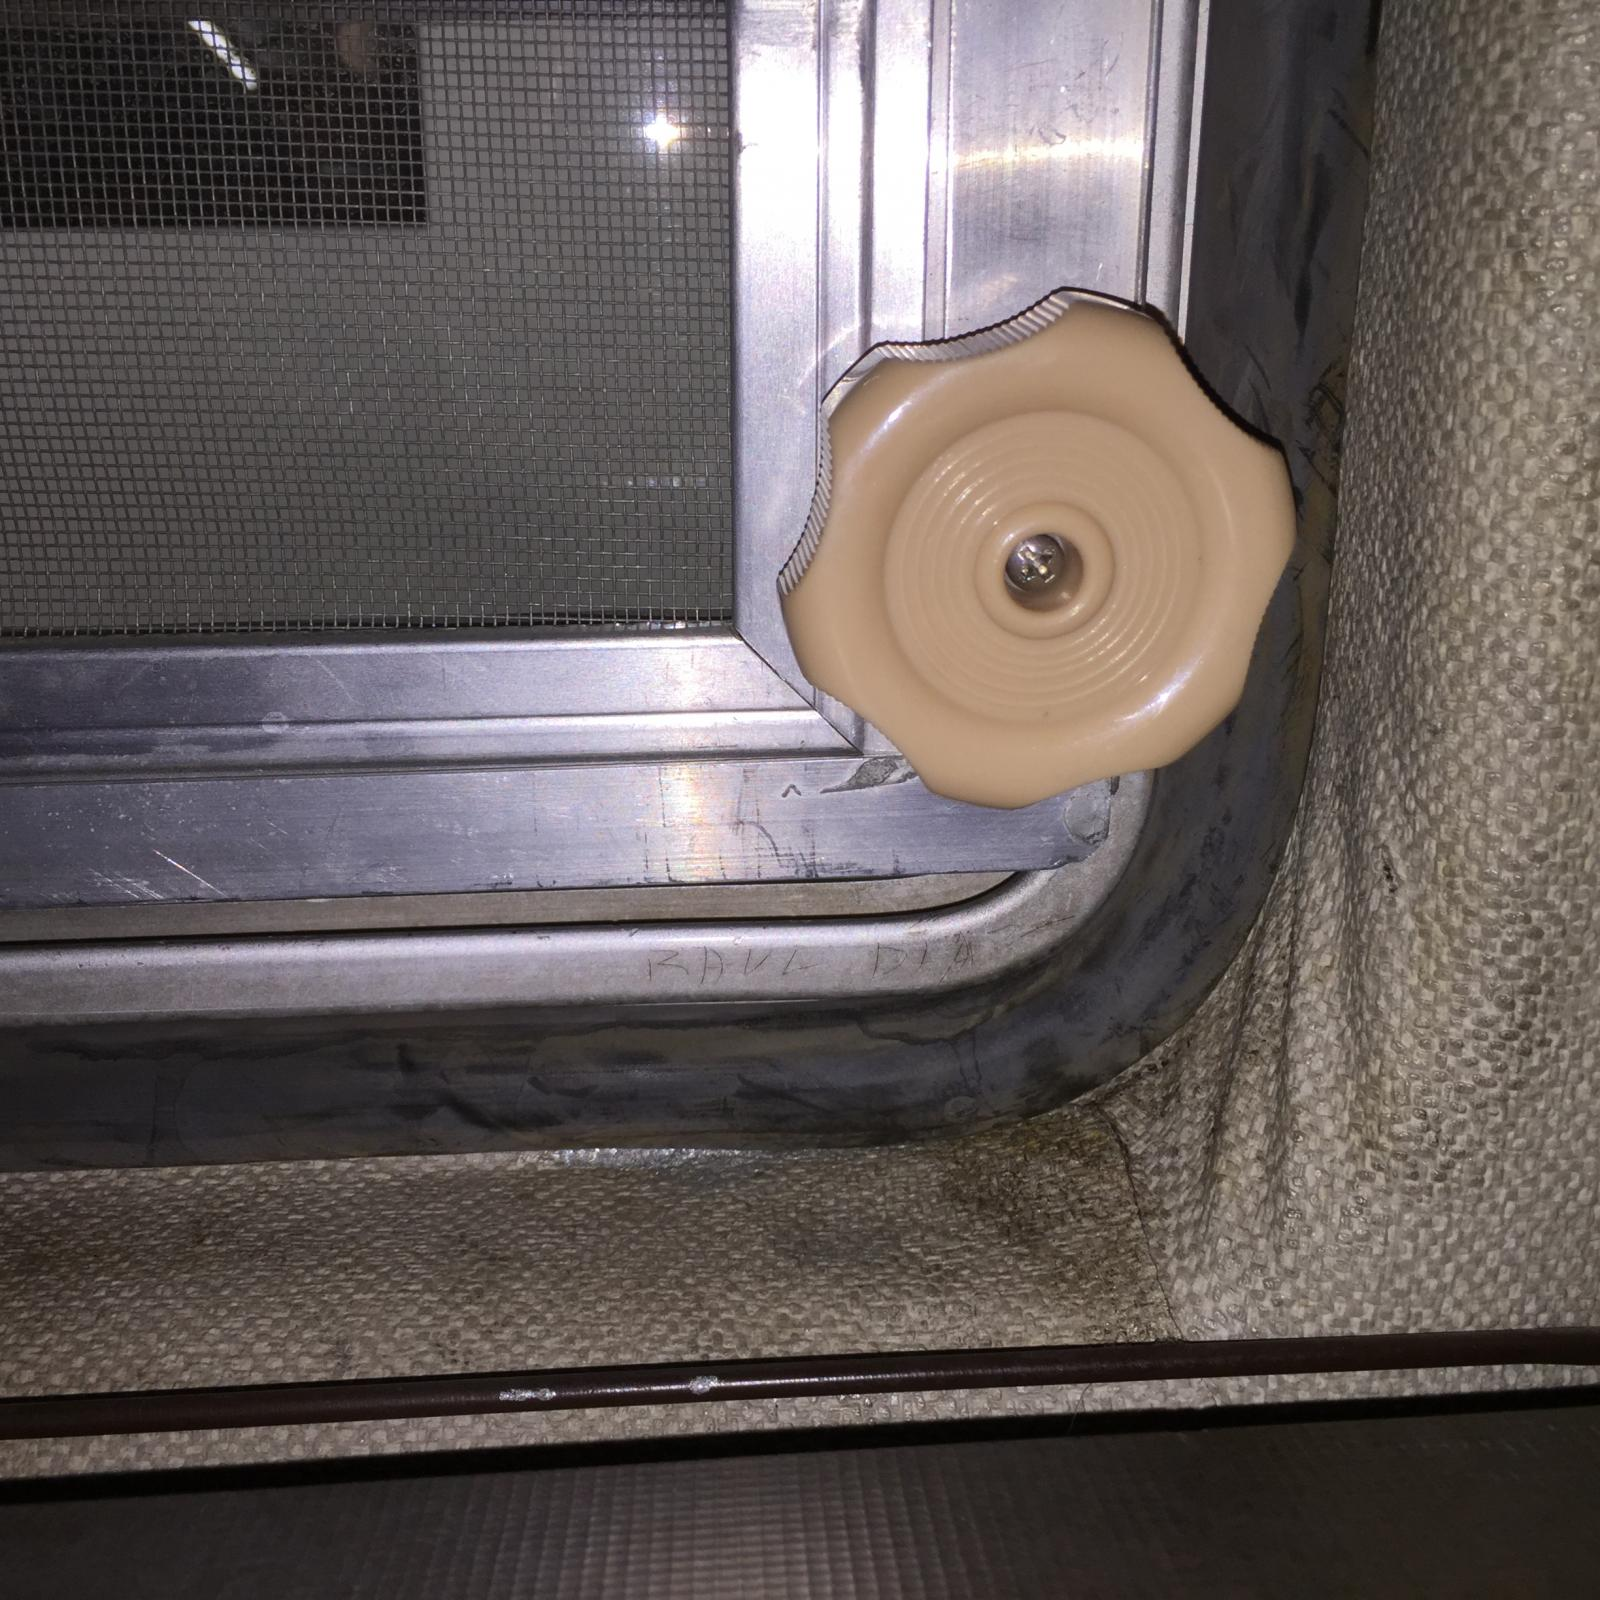 More jalousie window action